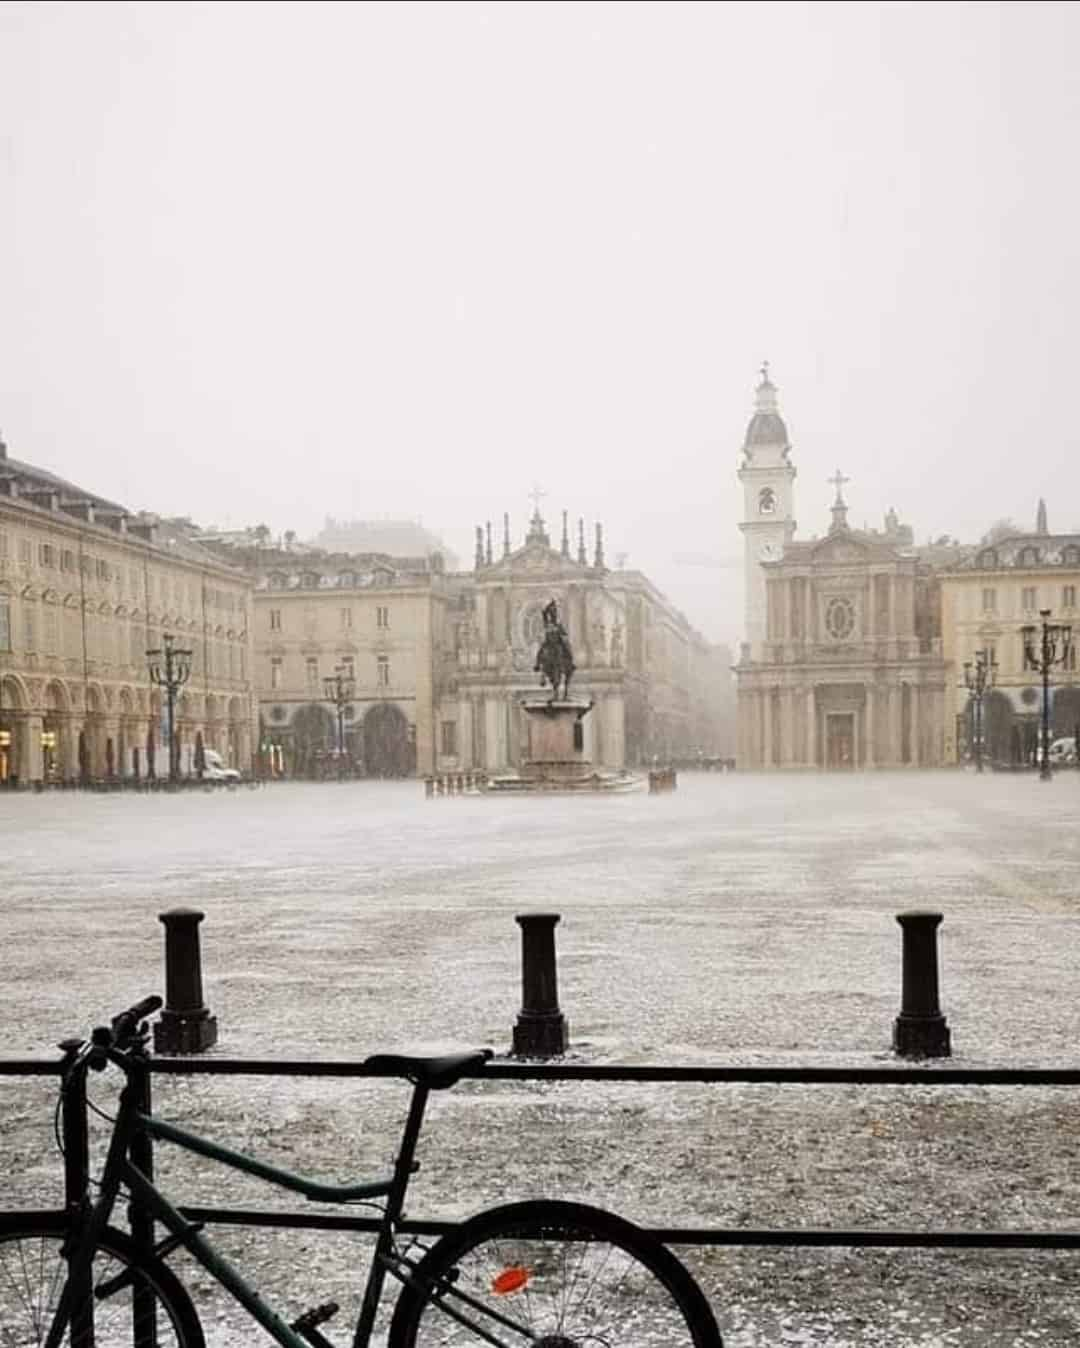 217635042 3038515296382373 4976273597462067942 n - Grandine devastante, foto galleria dall'area metropolitana di Torino